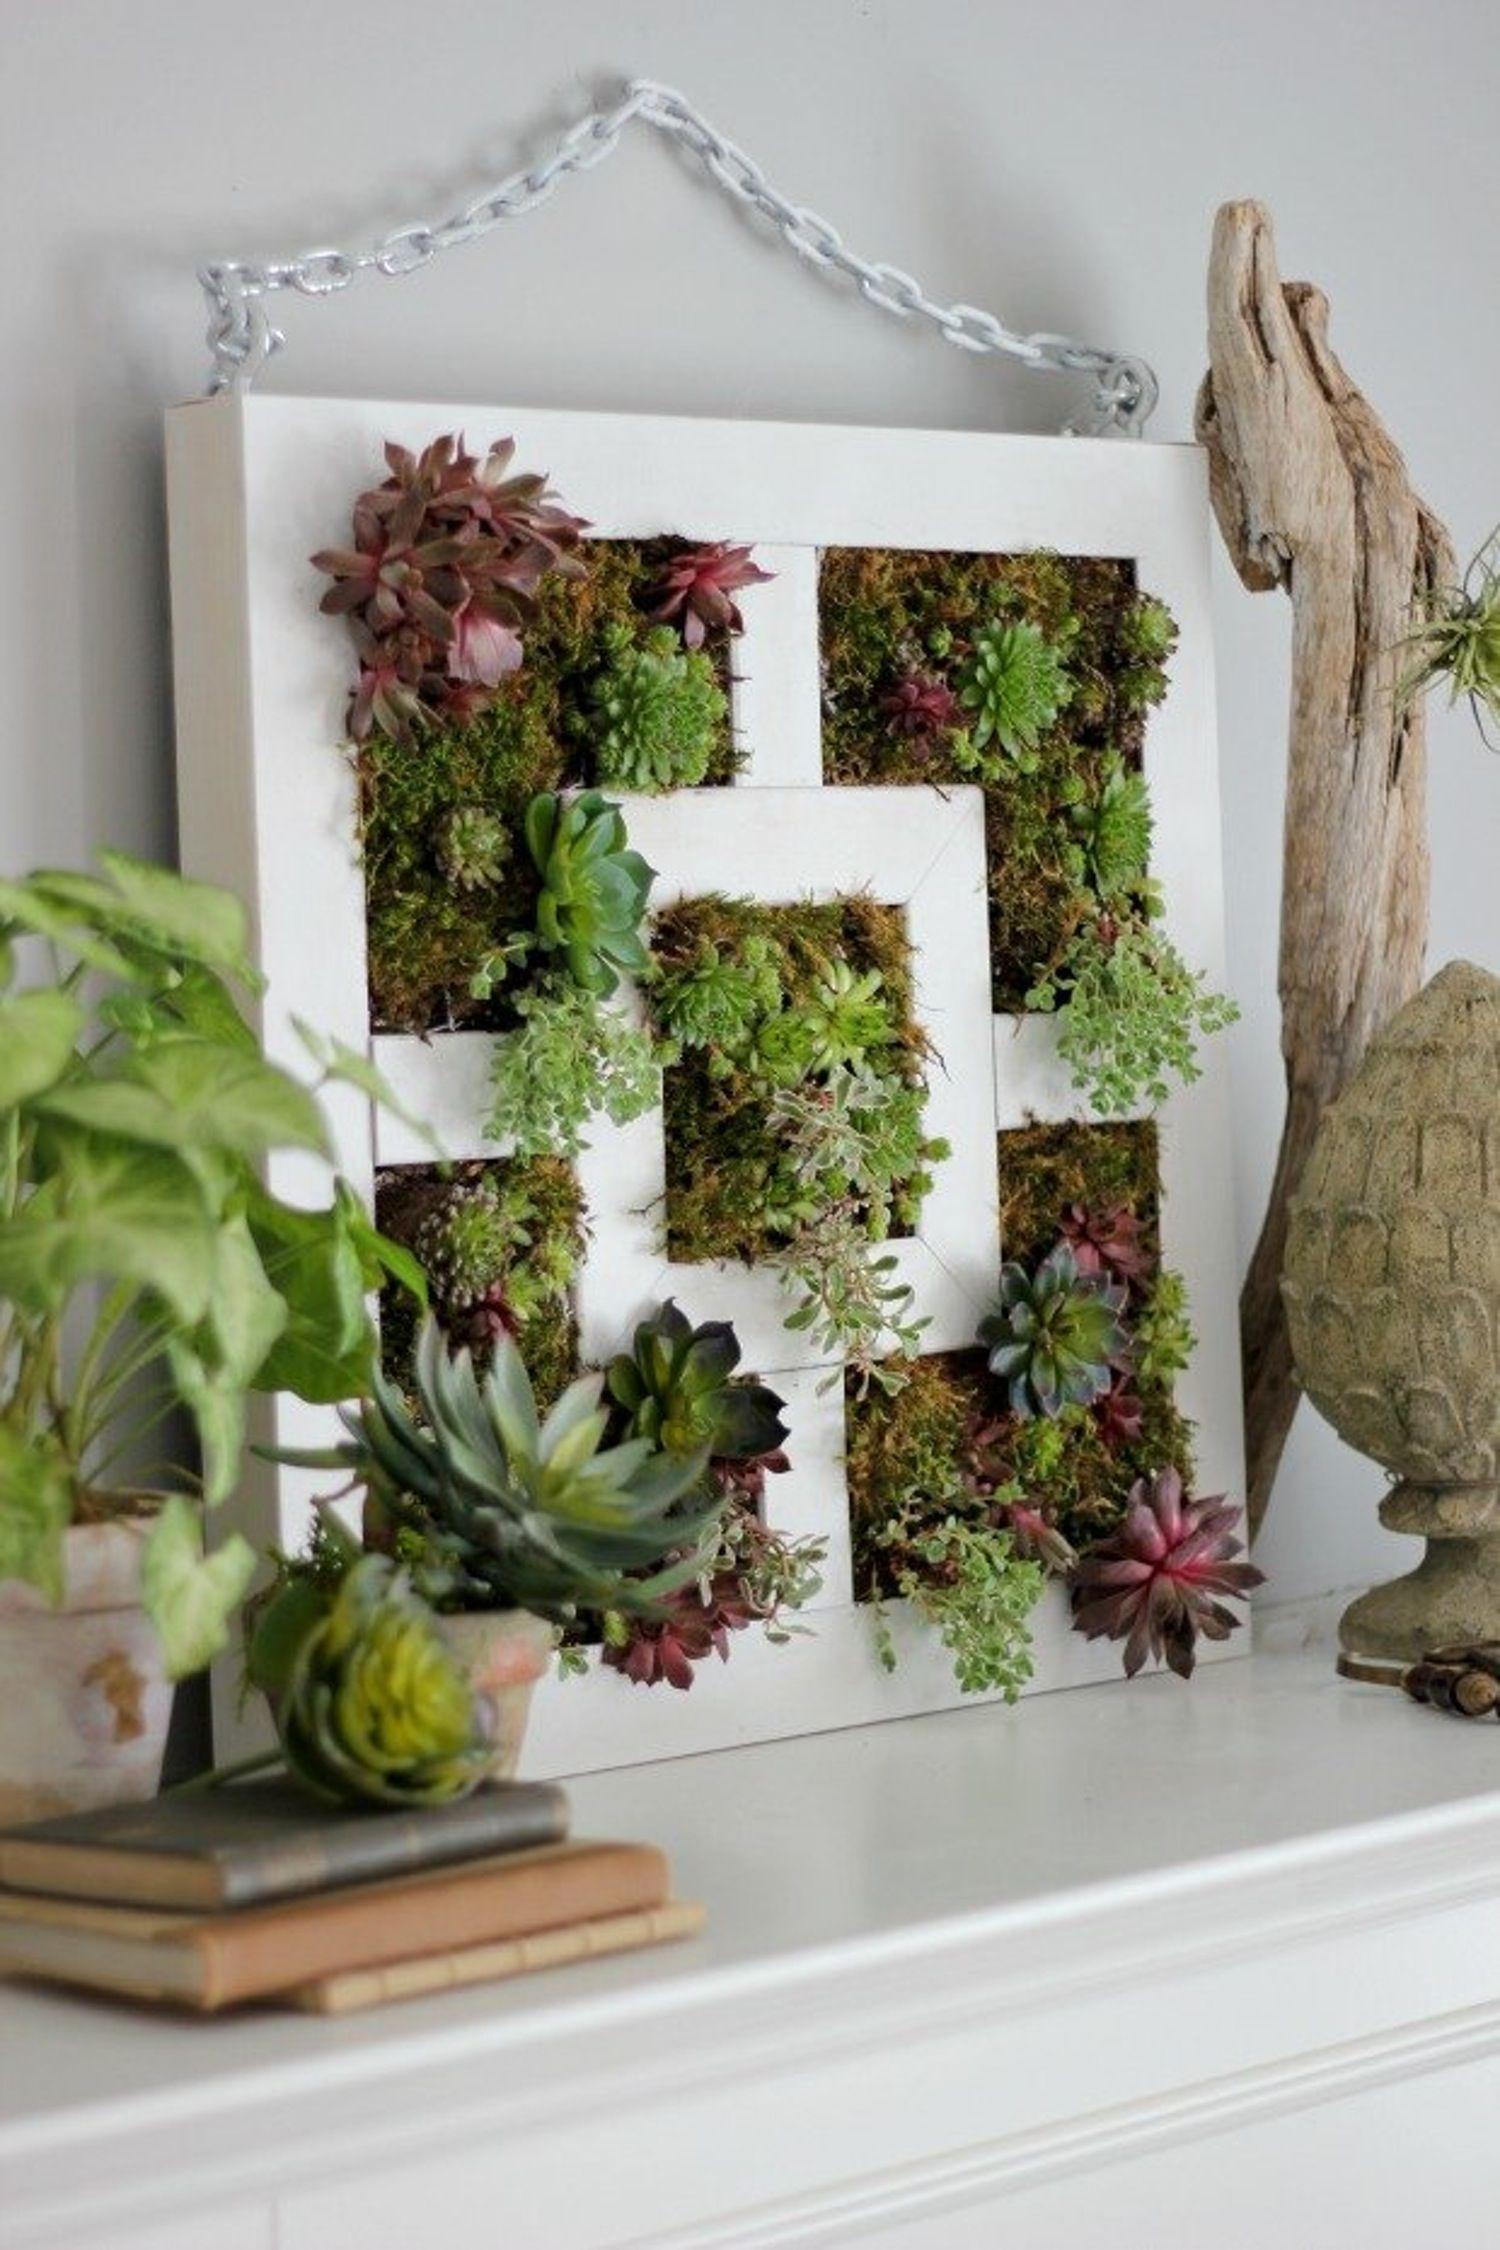 7 IKEA Hacks for Gorgeous Succulent Gardens | Vertical ...